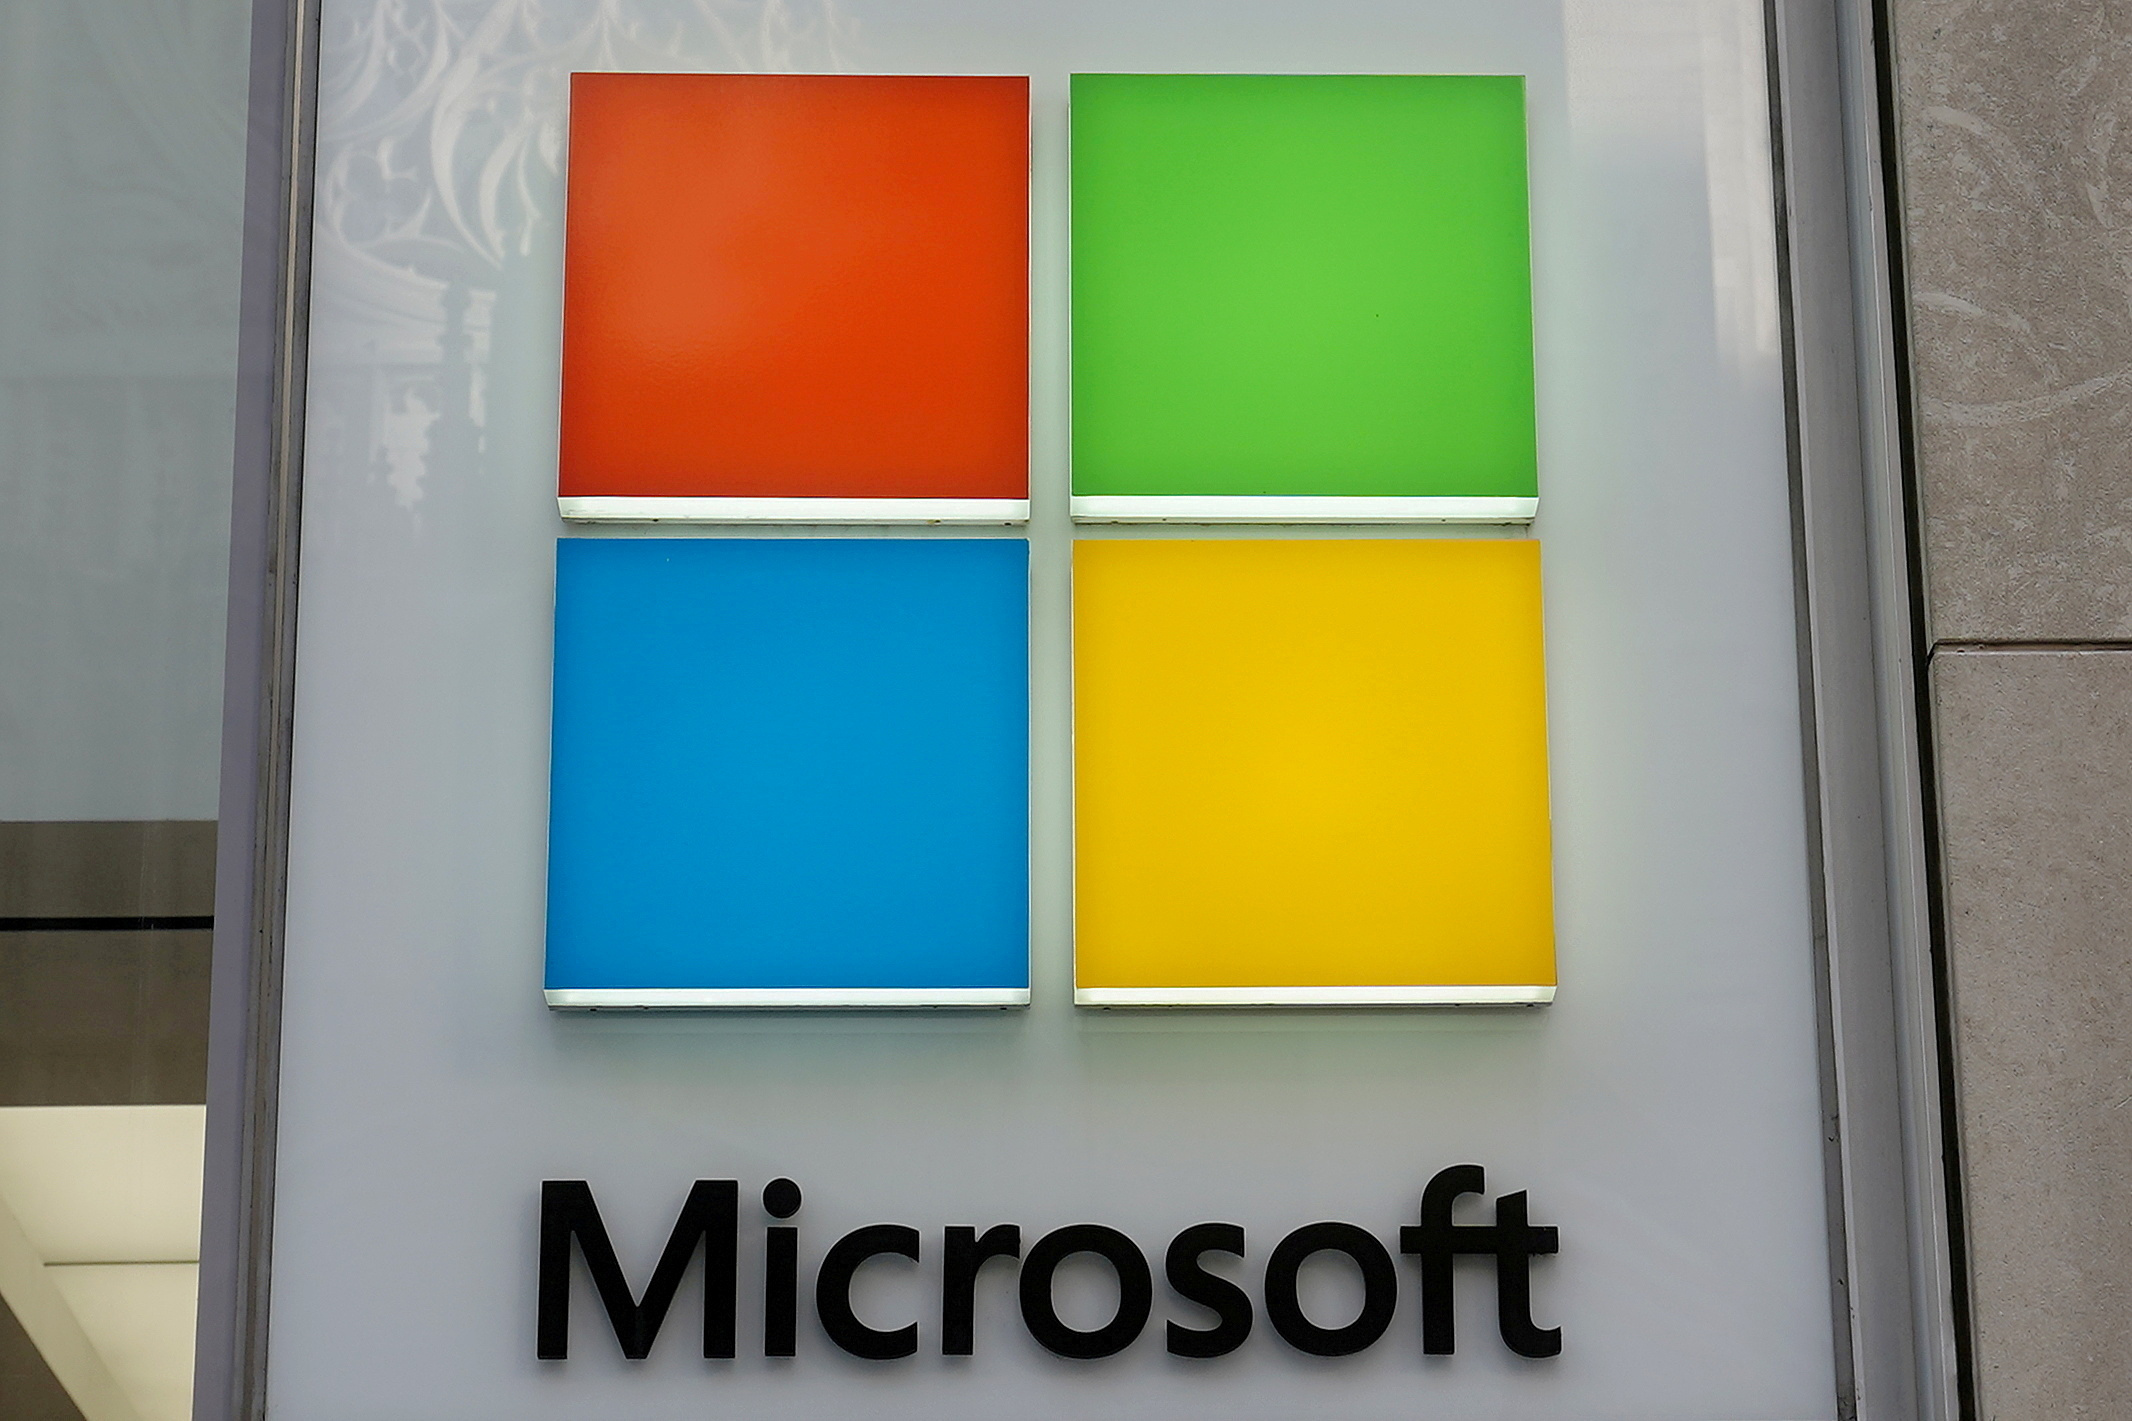 Microsoft: Η σχέση της με το ελληνικό στοιχείο και ο ρόλος του νέου Έλληνα μάνατζερ Κ. Λουκά